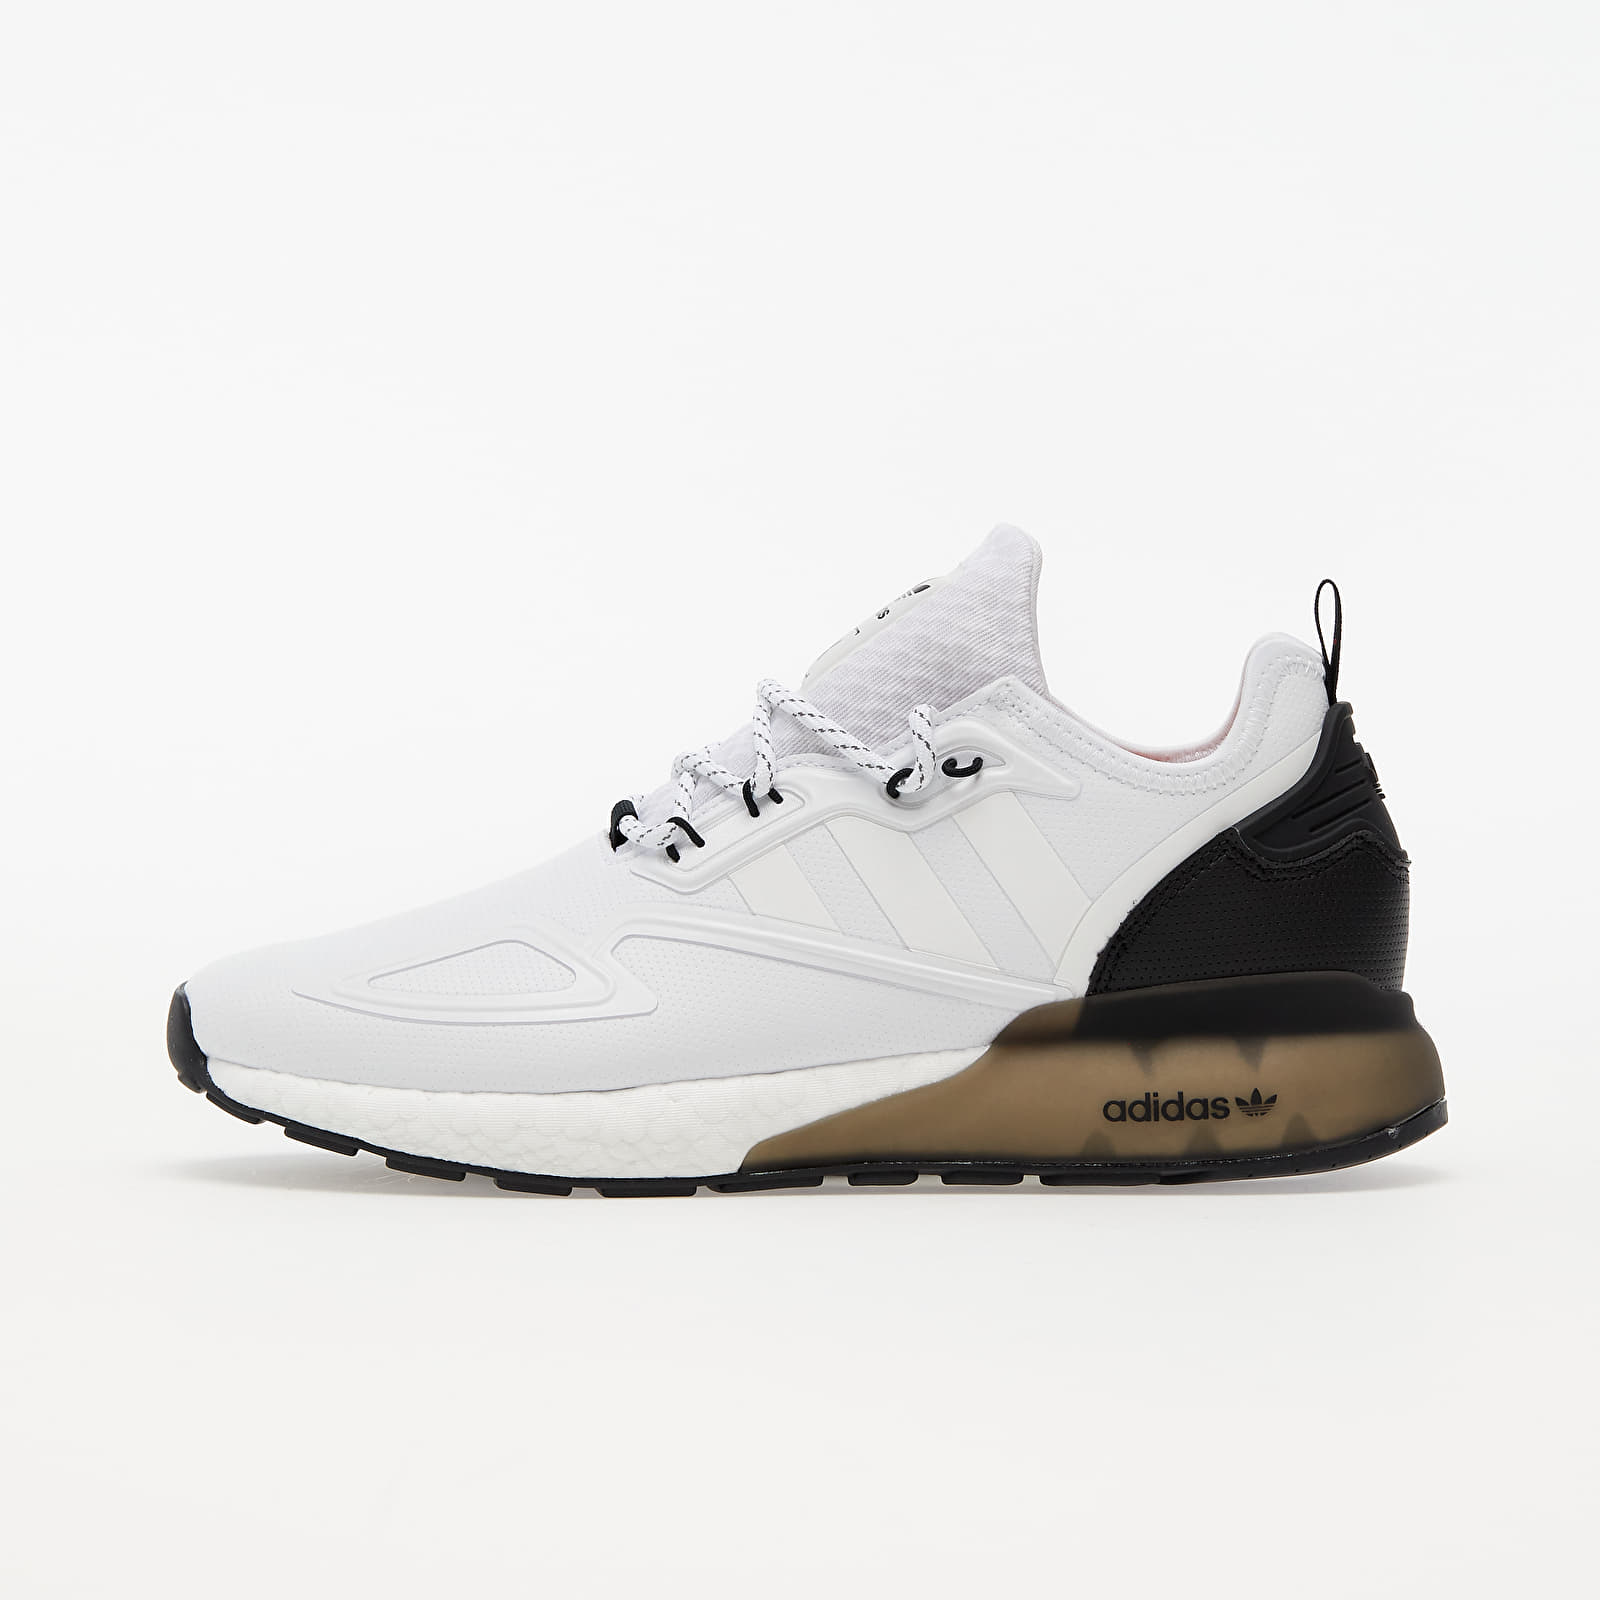 adidas ZX 2K BOOST Ftwr White/ Ftwr White/ Core Black   Footshop